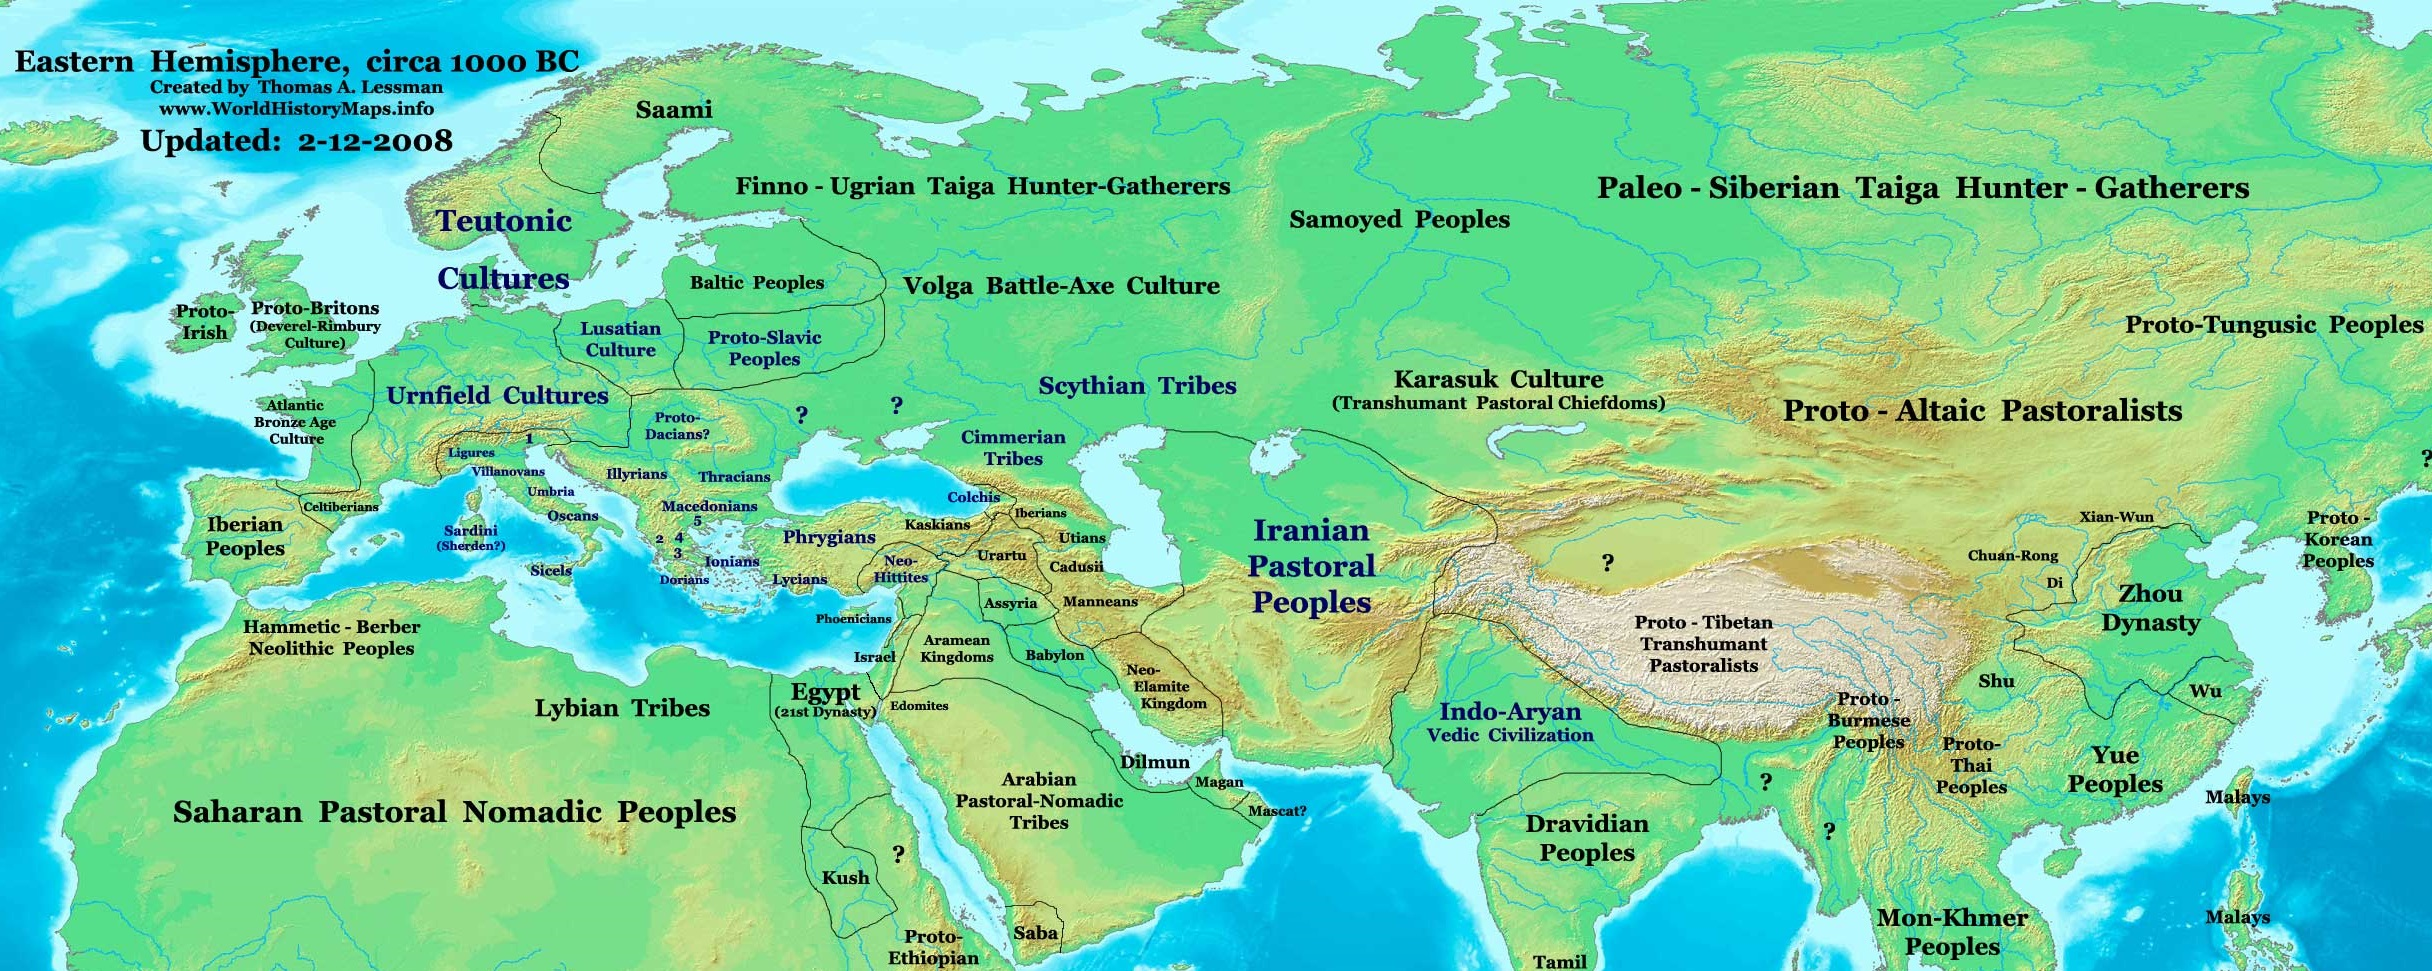 1000 BC